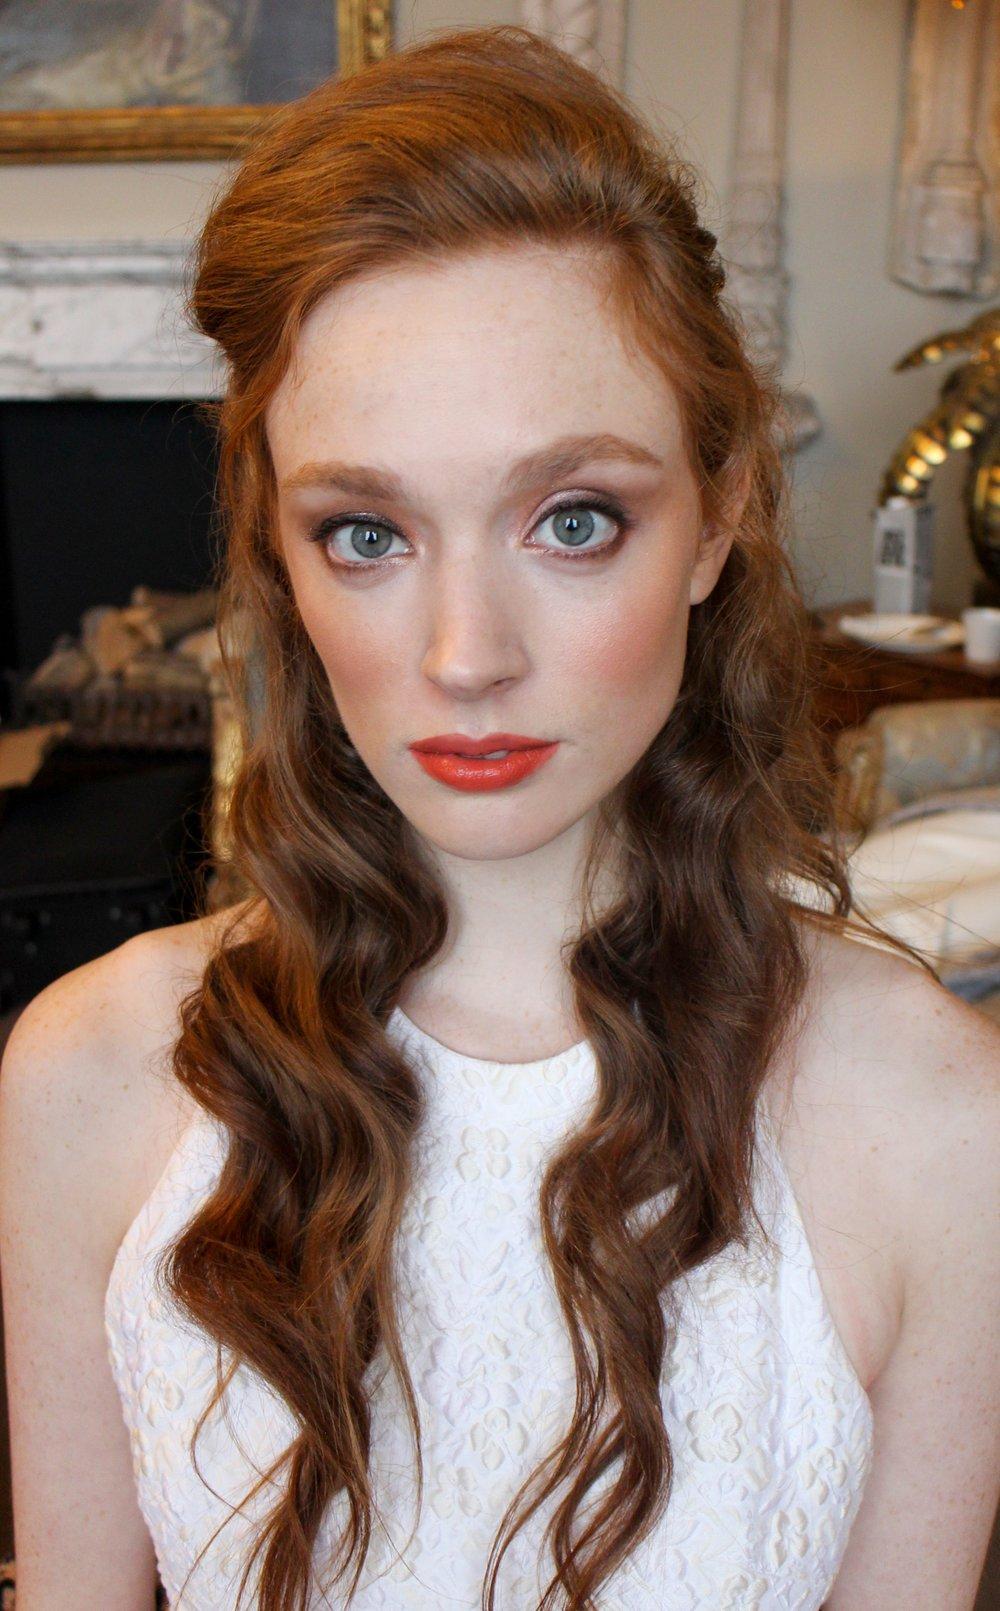 Bridal Hair and makeup by Nicola Honey Artistry